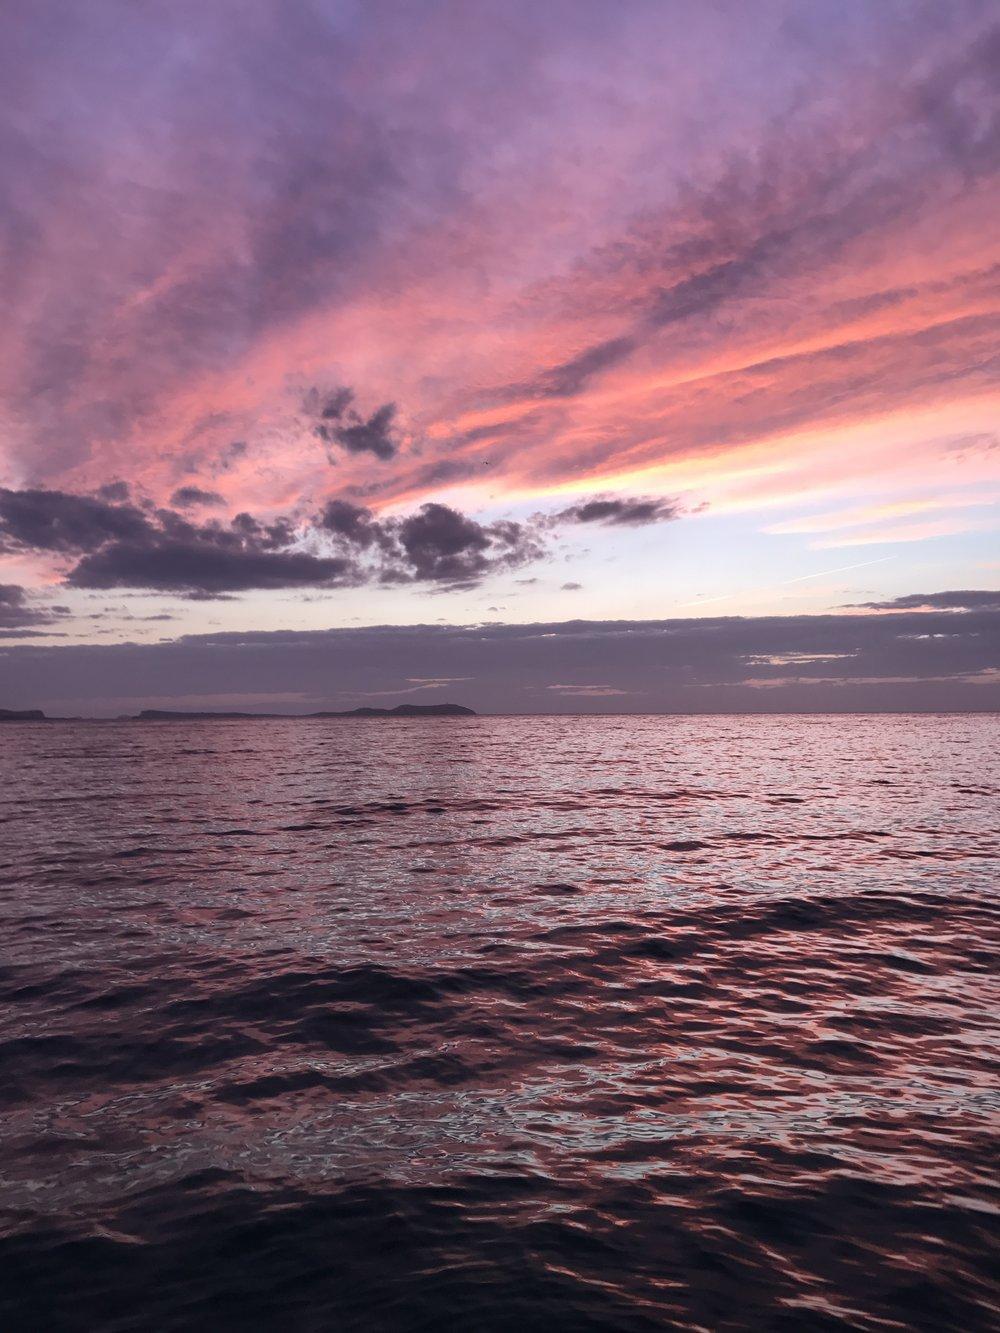 sunset_boats_ibiza_private_chartered_boats_sunset_garry_infin8_life_cafe_mambo_group_evissa_ibiza_elle_blonde_luxury_lifestyle_blog